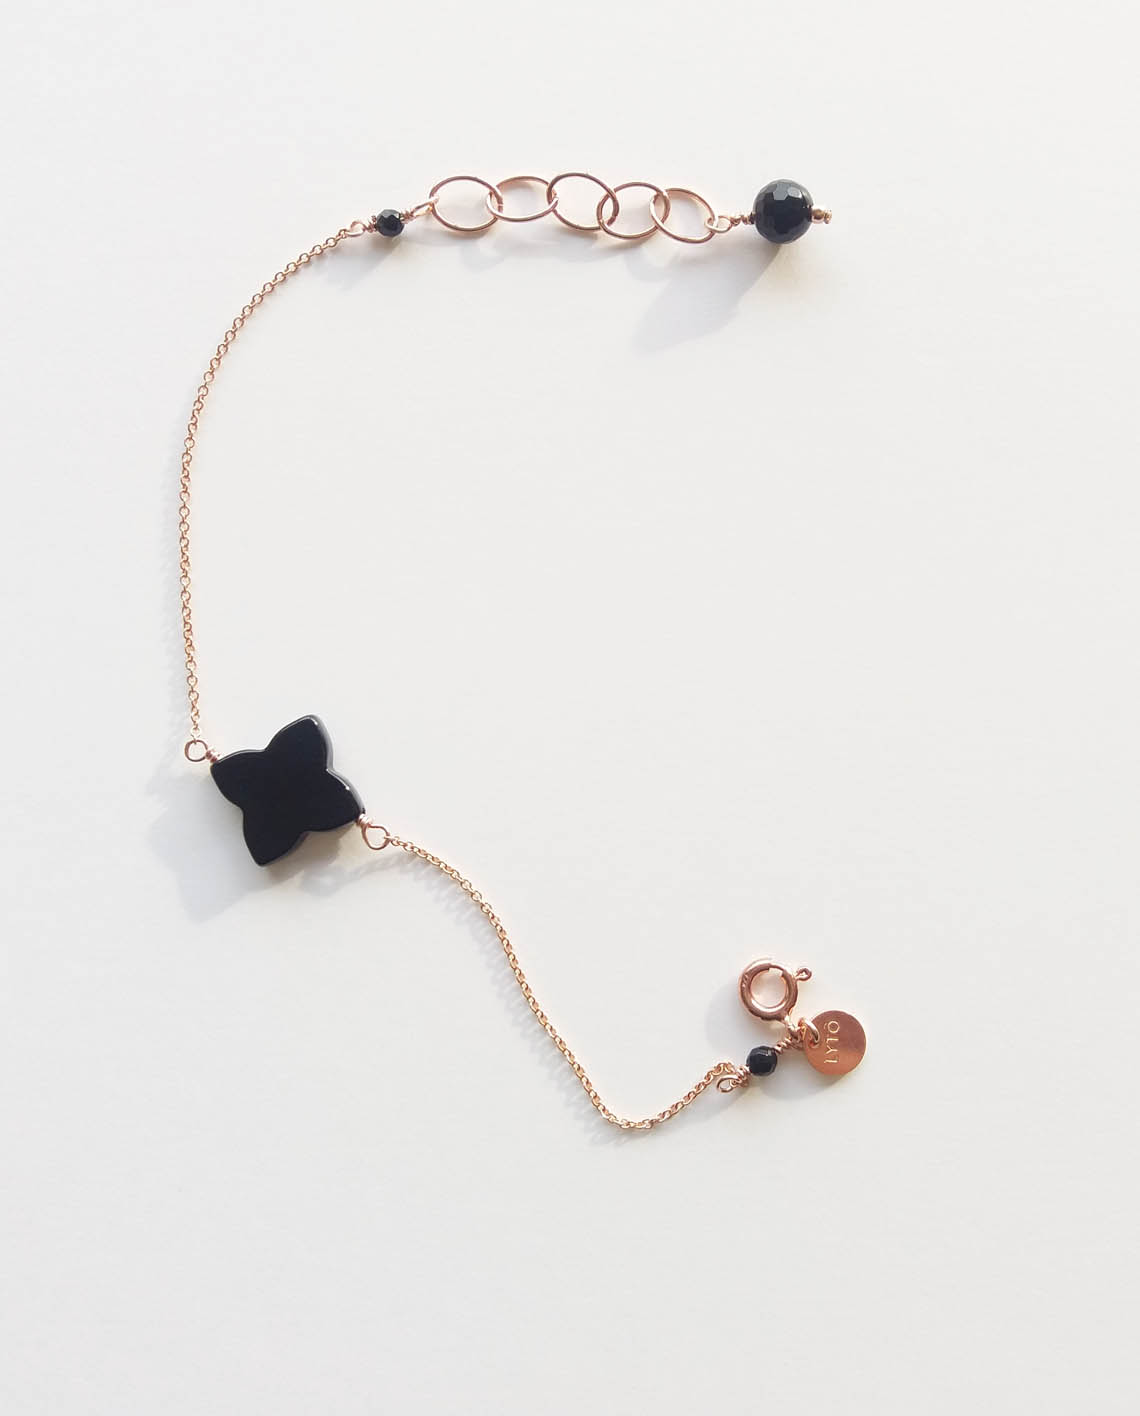 lyto-bijoux-as-de-trefle-brac-1